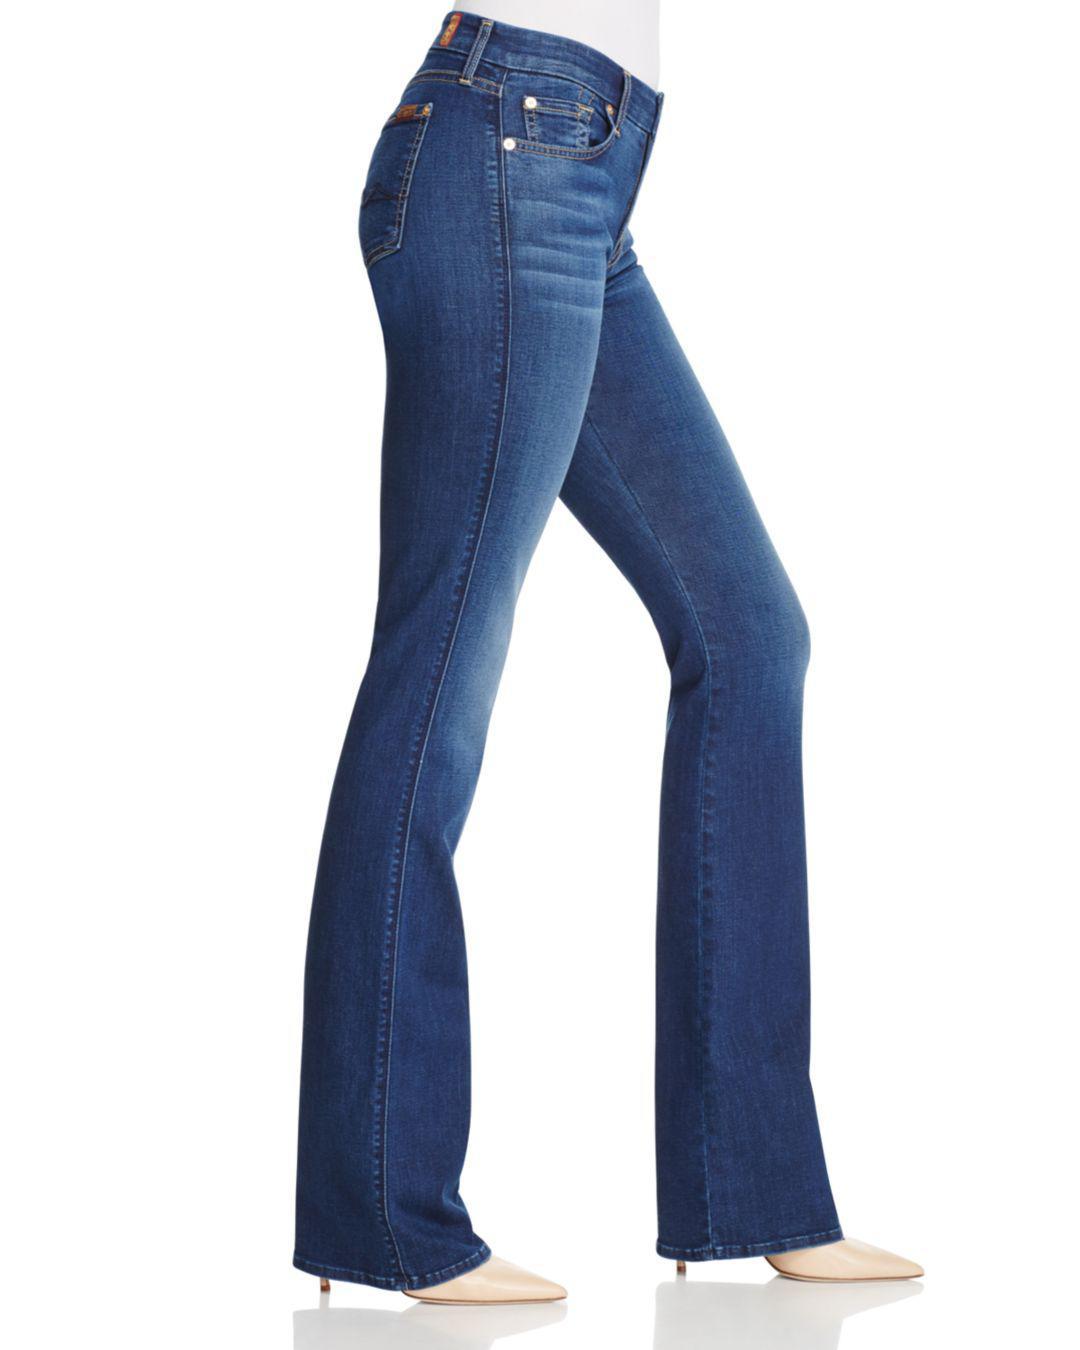 7 For All Mankind Denim B(air) Kimmie Bootcut Jeans In Duchess in Blue